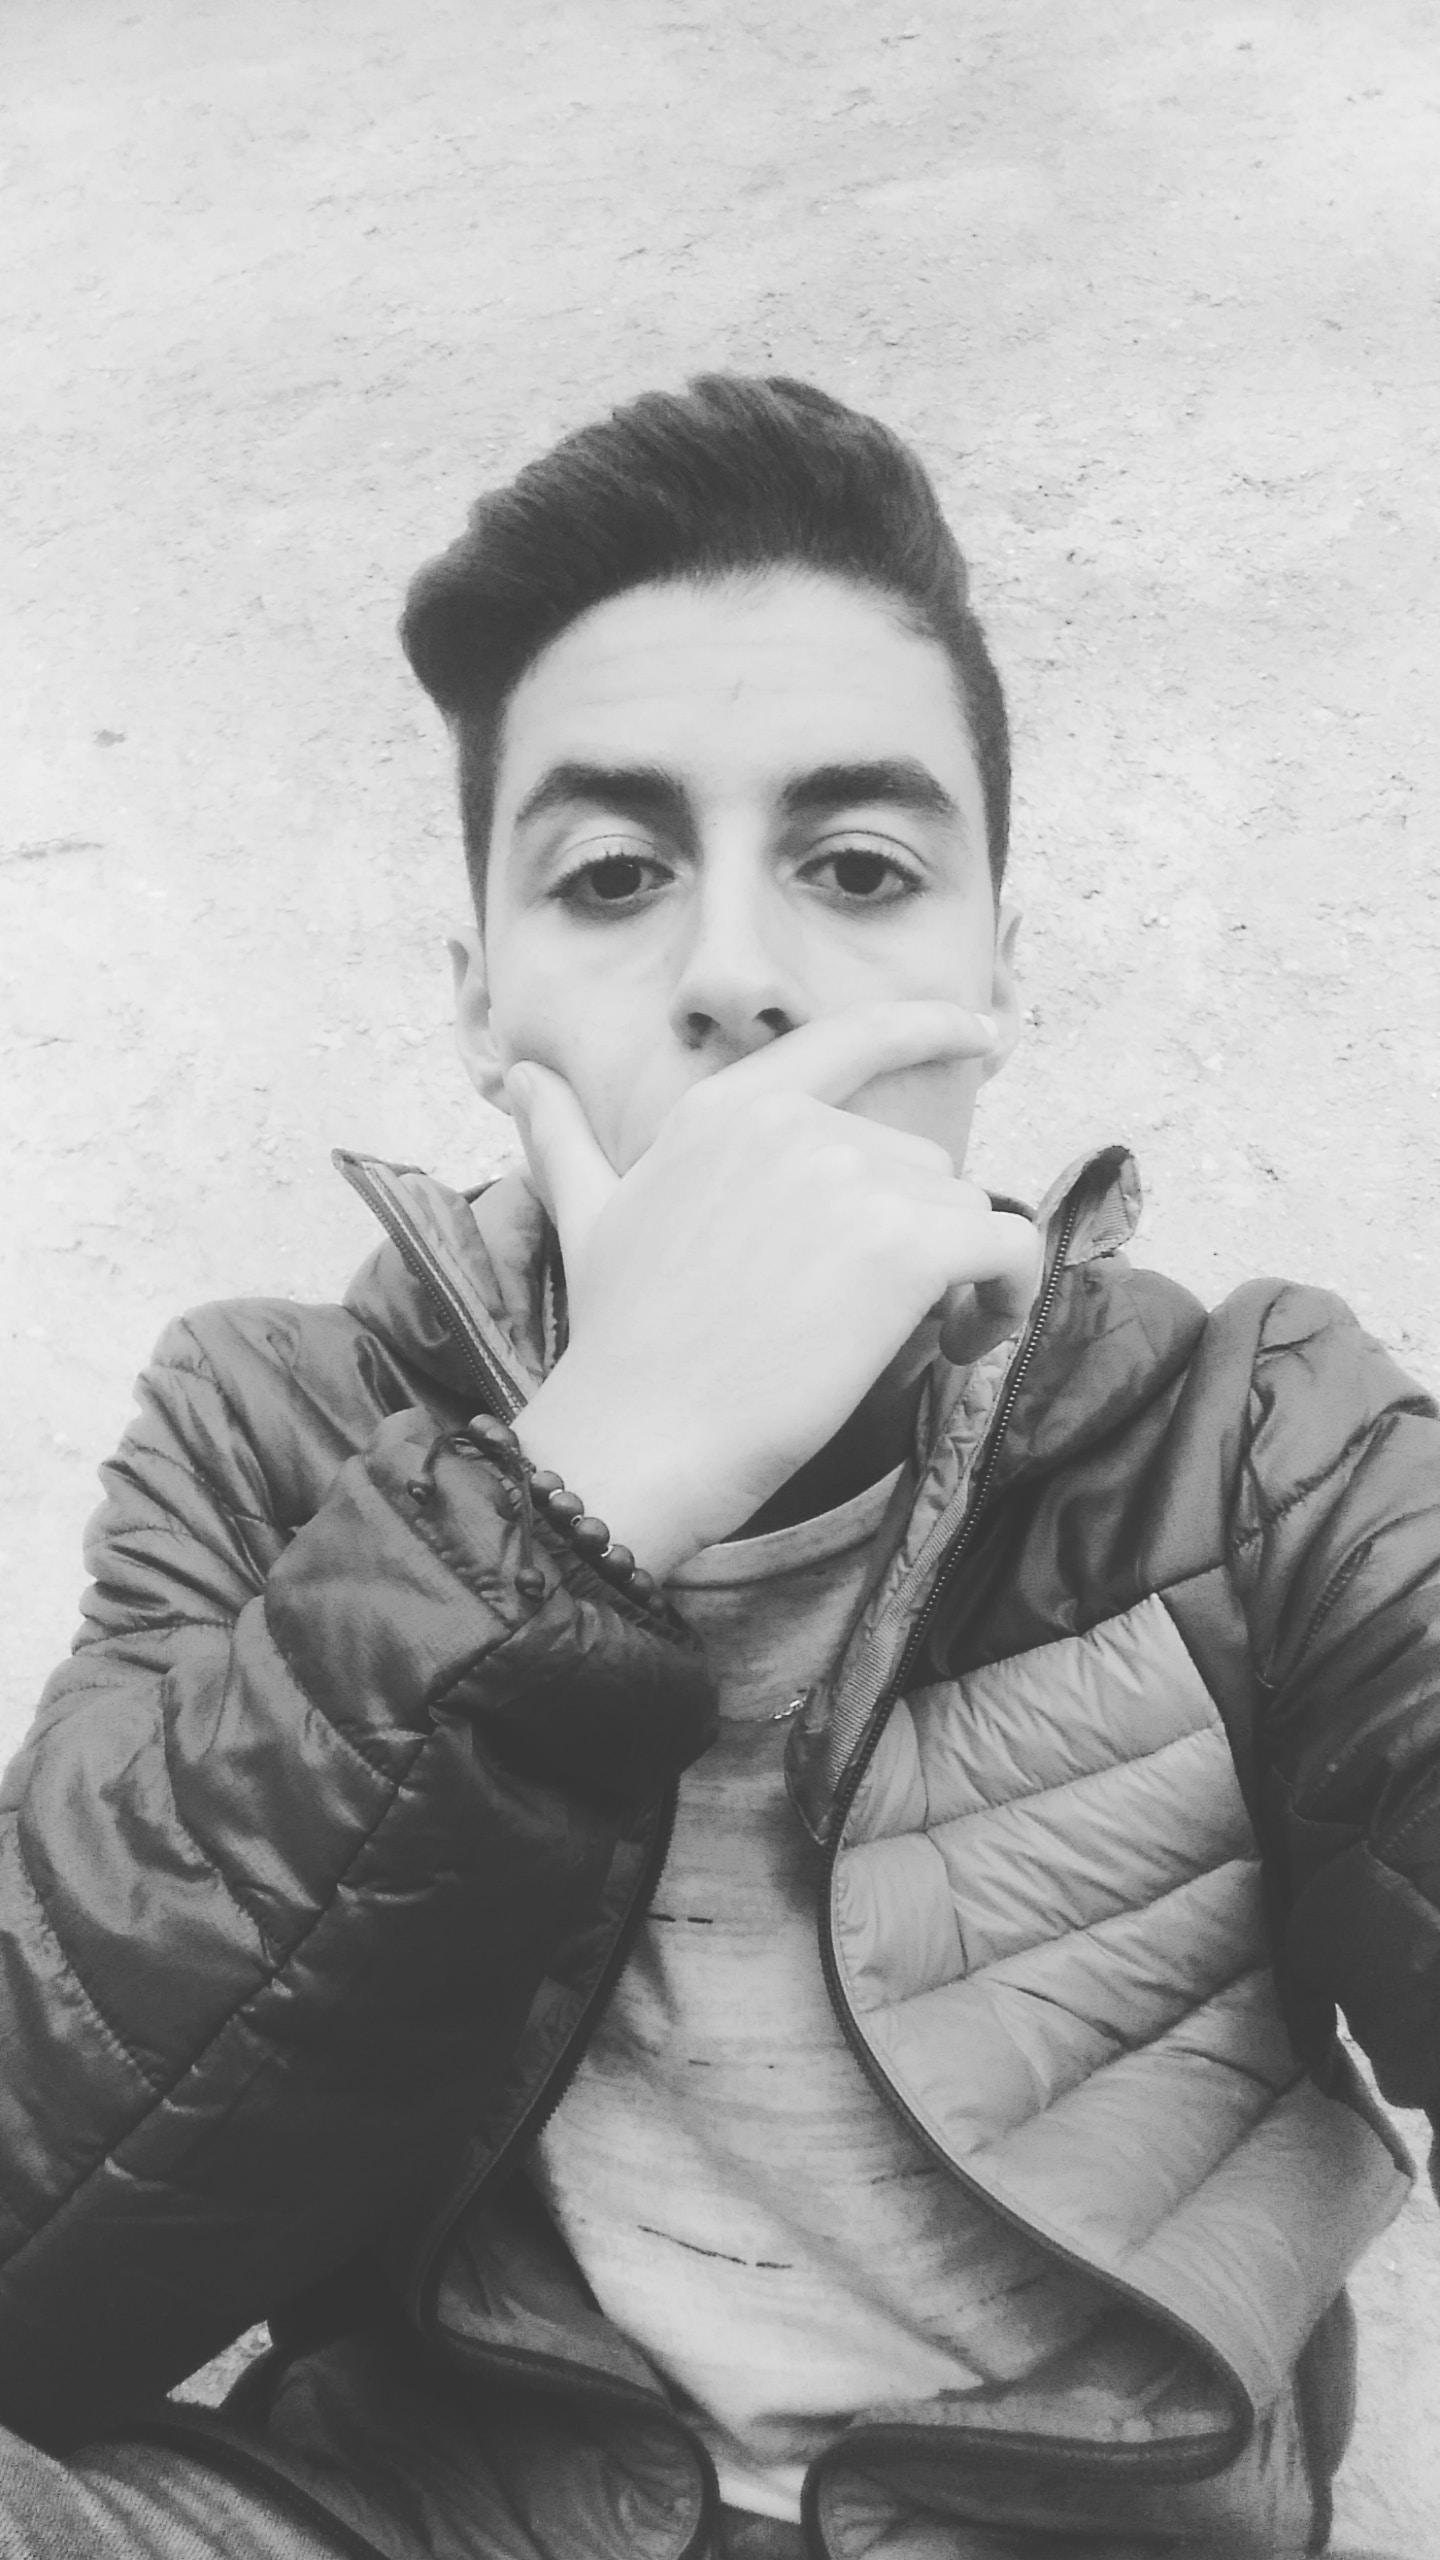 Go to hamada azzouzi's profile